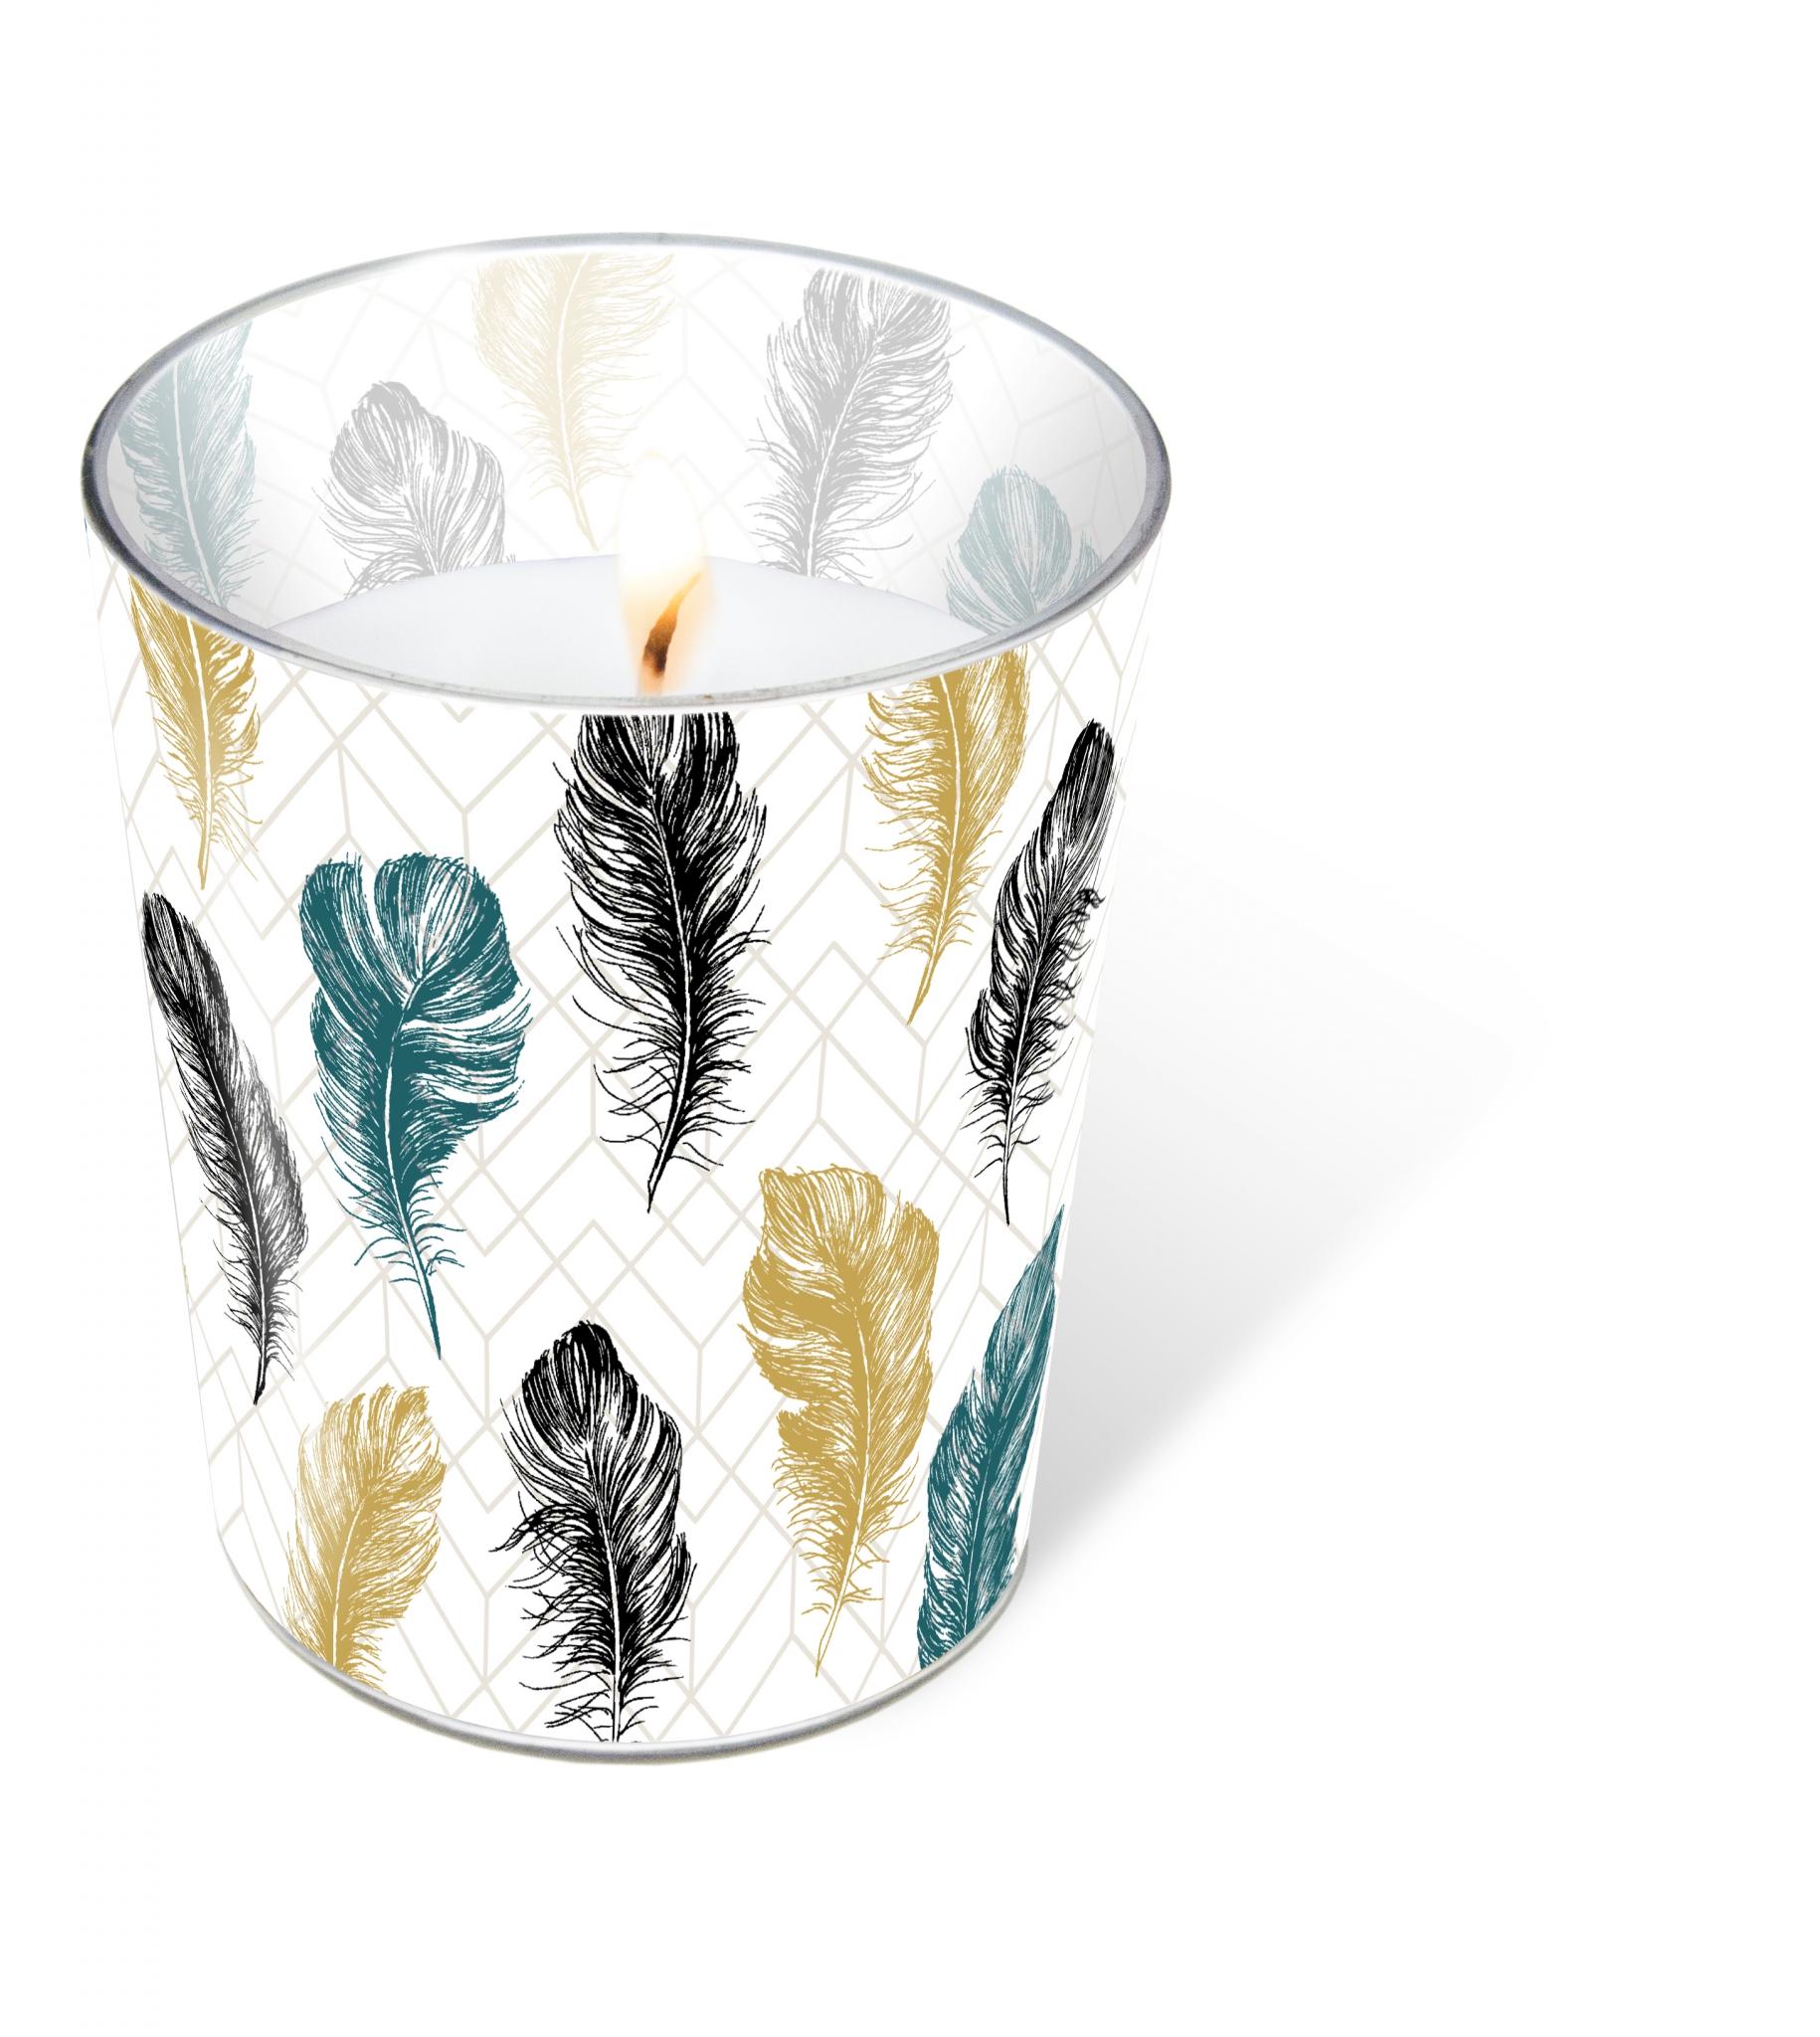 Glaskerze - Coloured feathers